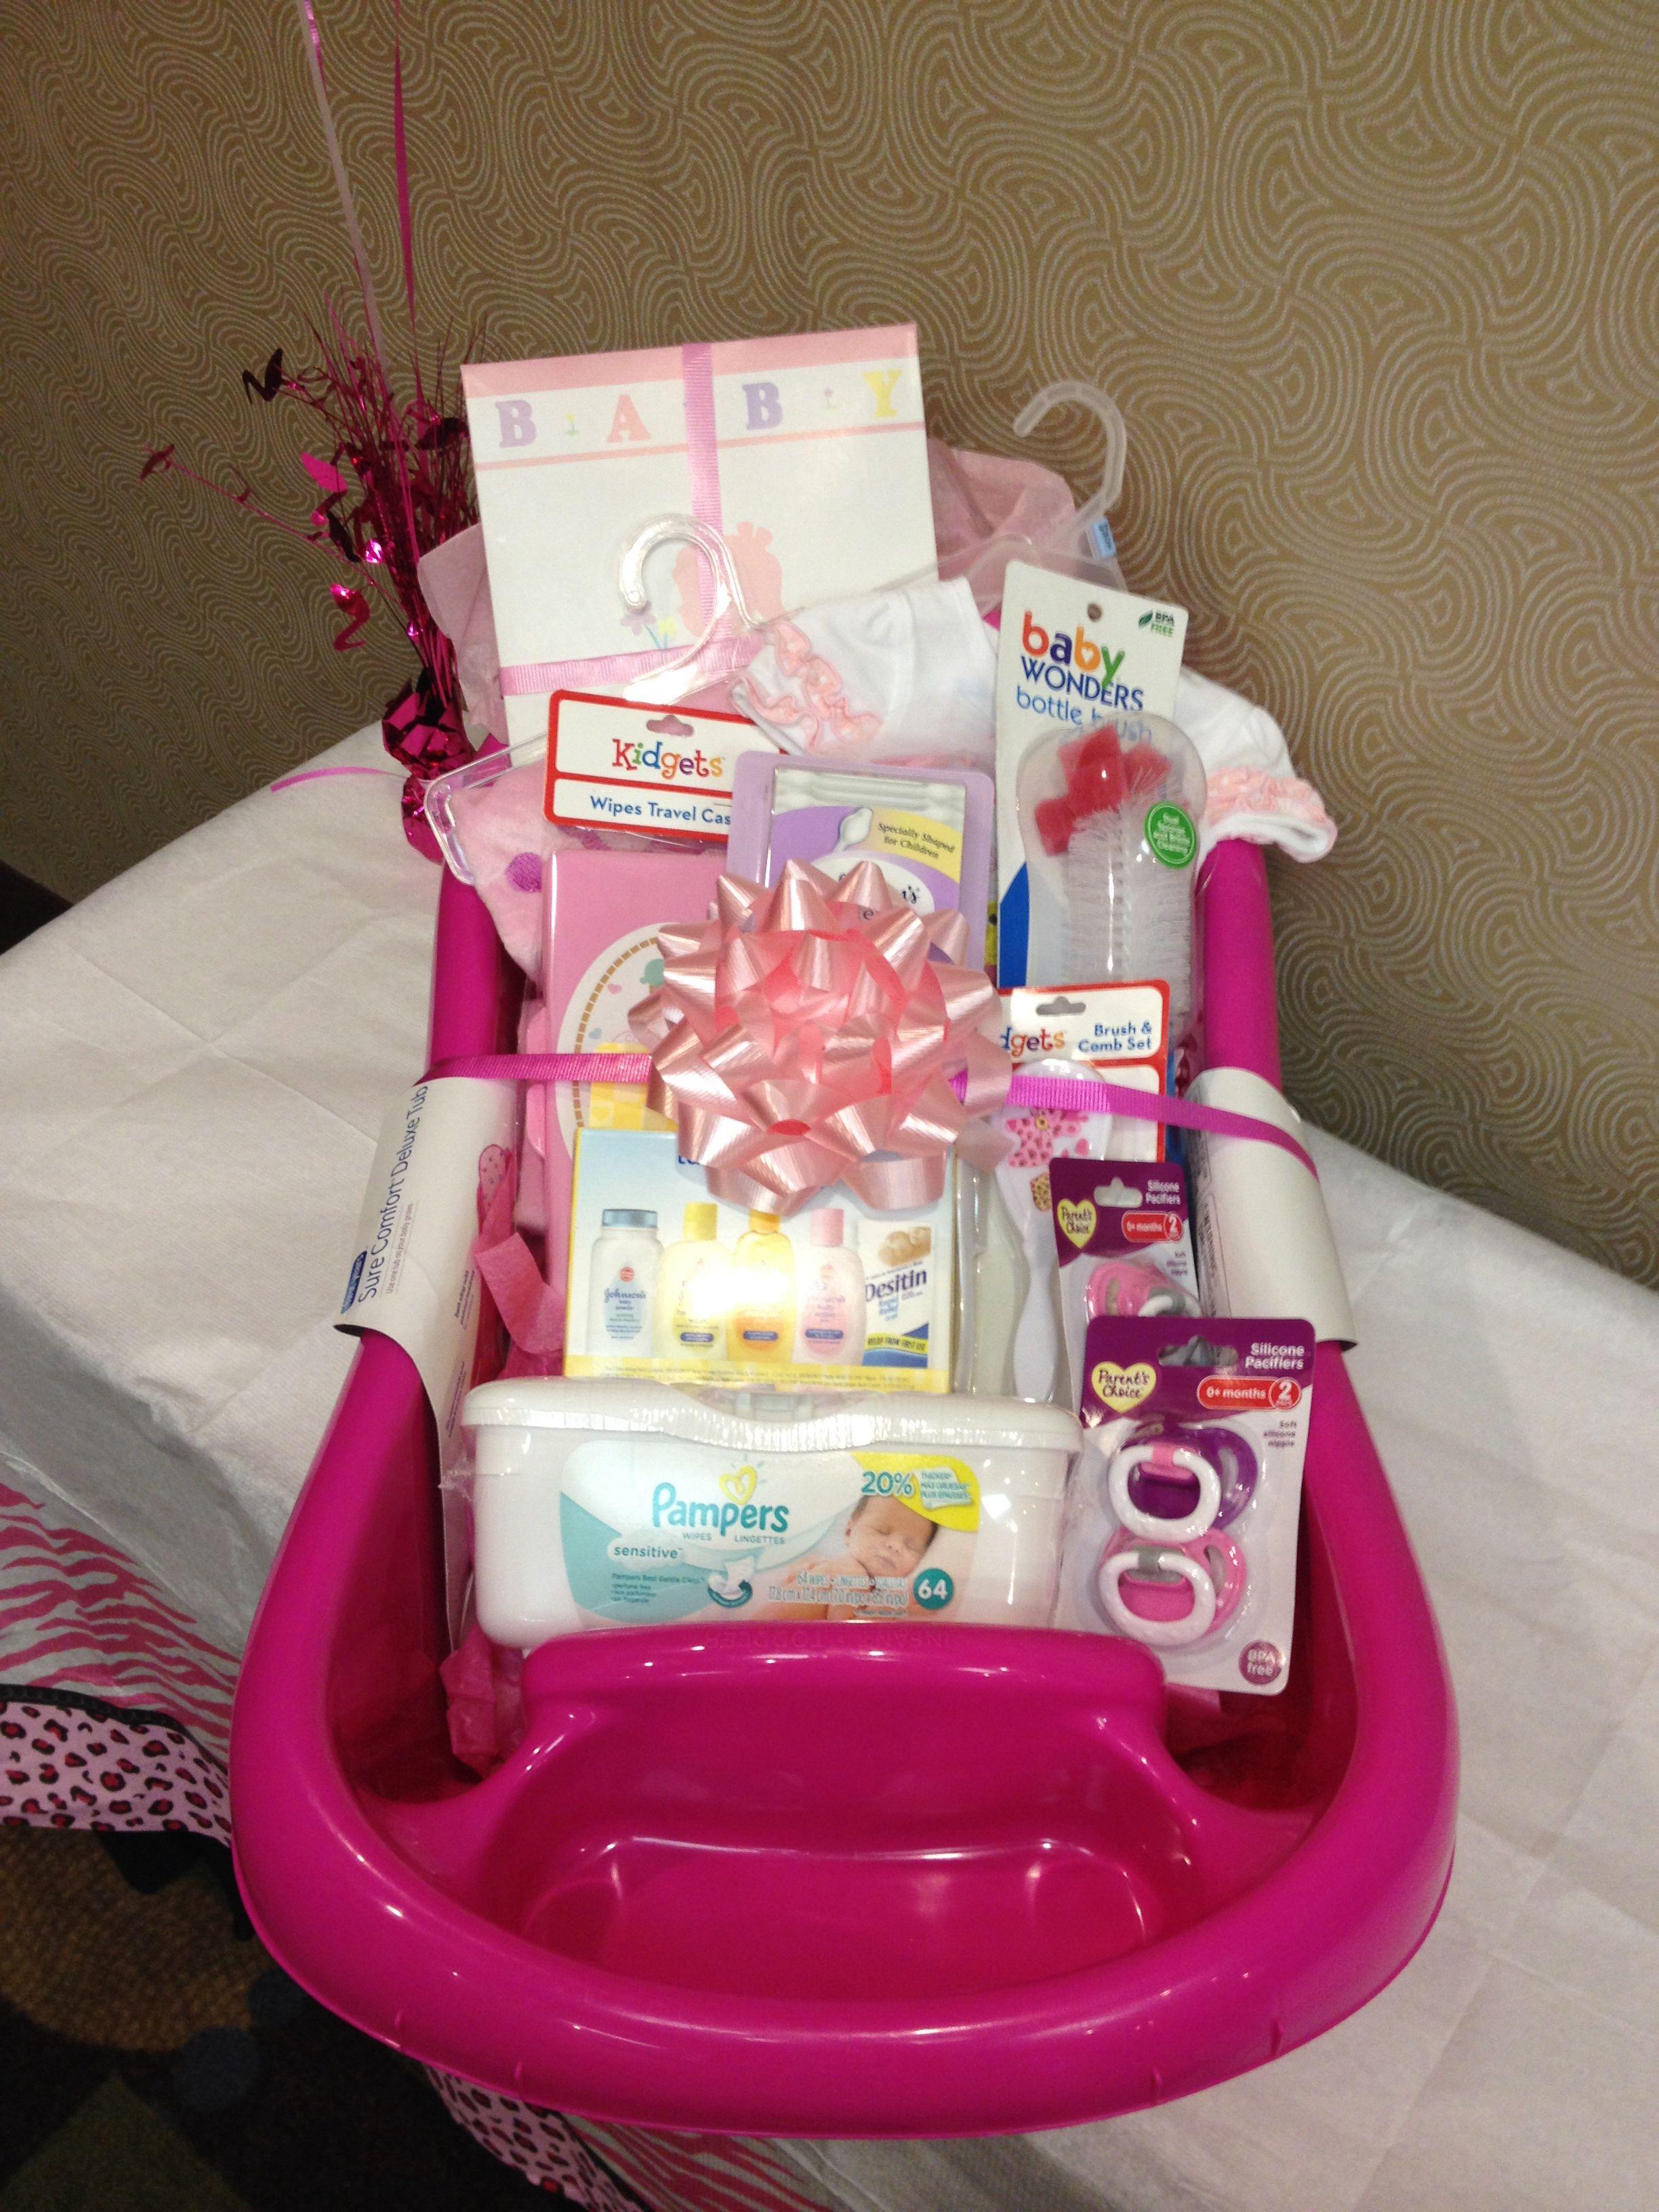 Best Baby Gift Basket Ideas : Best baby tub gift basket ideas on